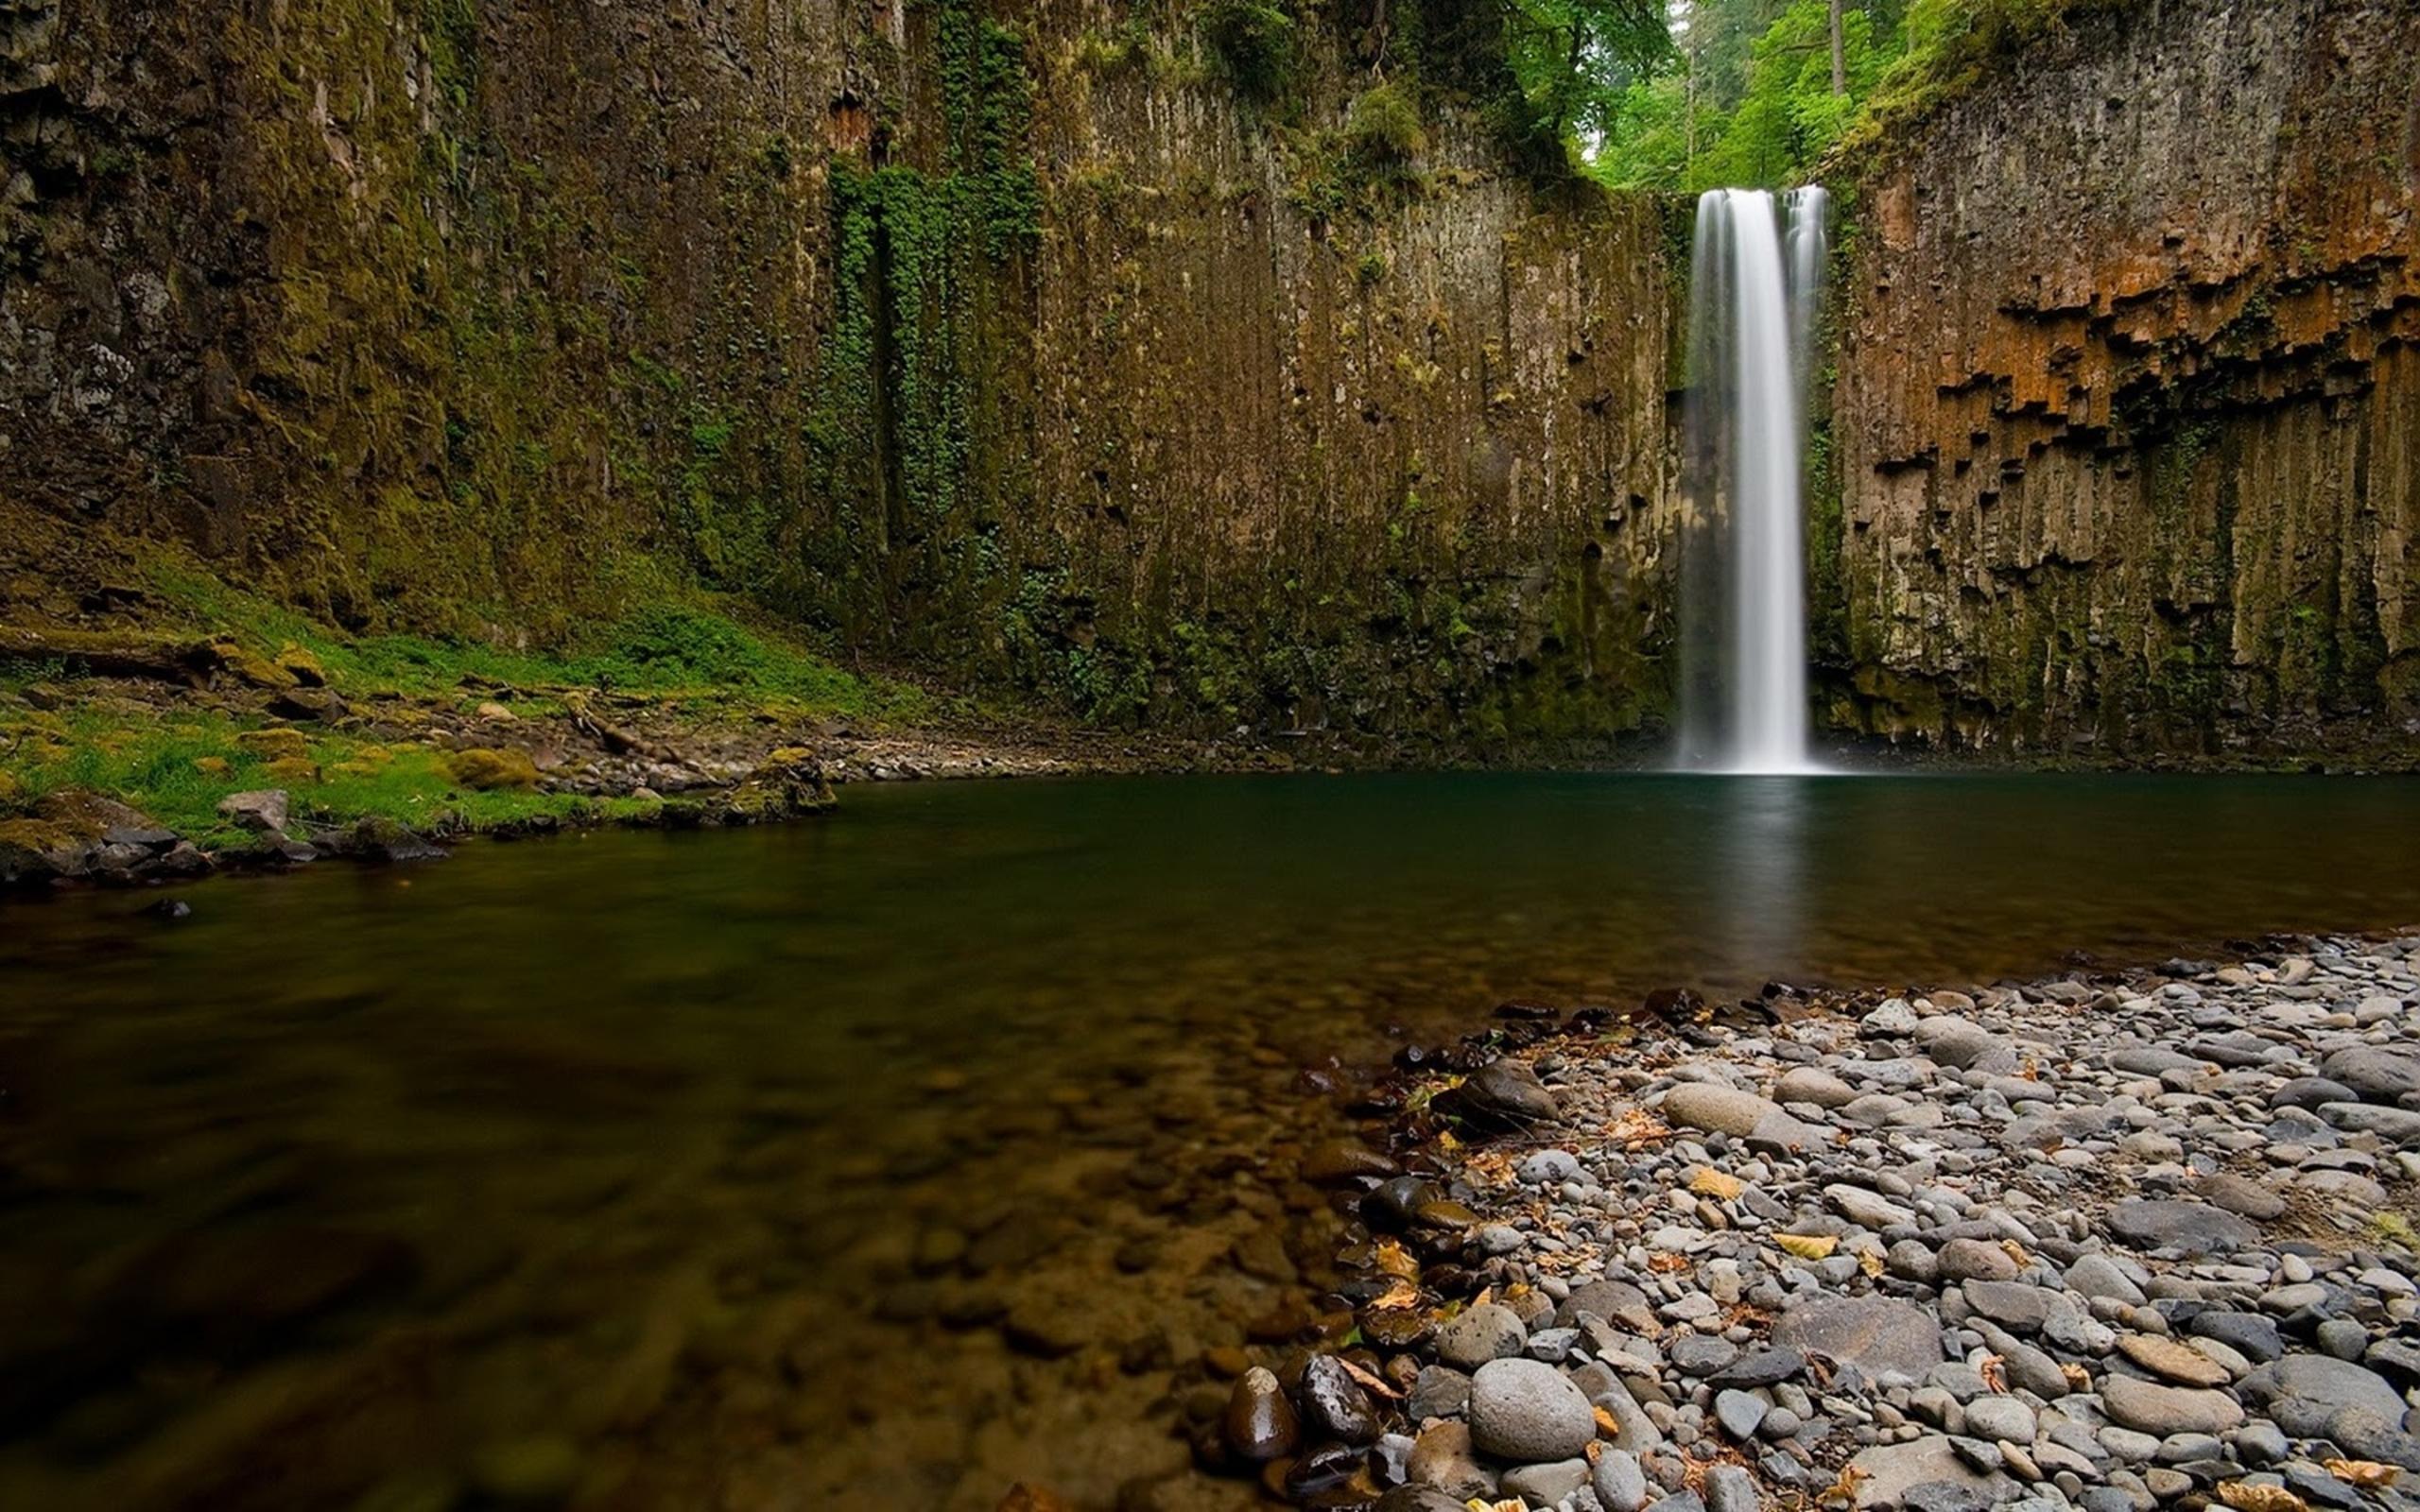 Fresh New Fall Hd Wallpapers Stones River Waterfall Nature Wallpaper Hd